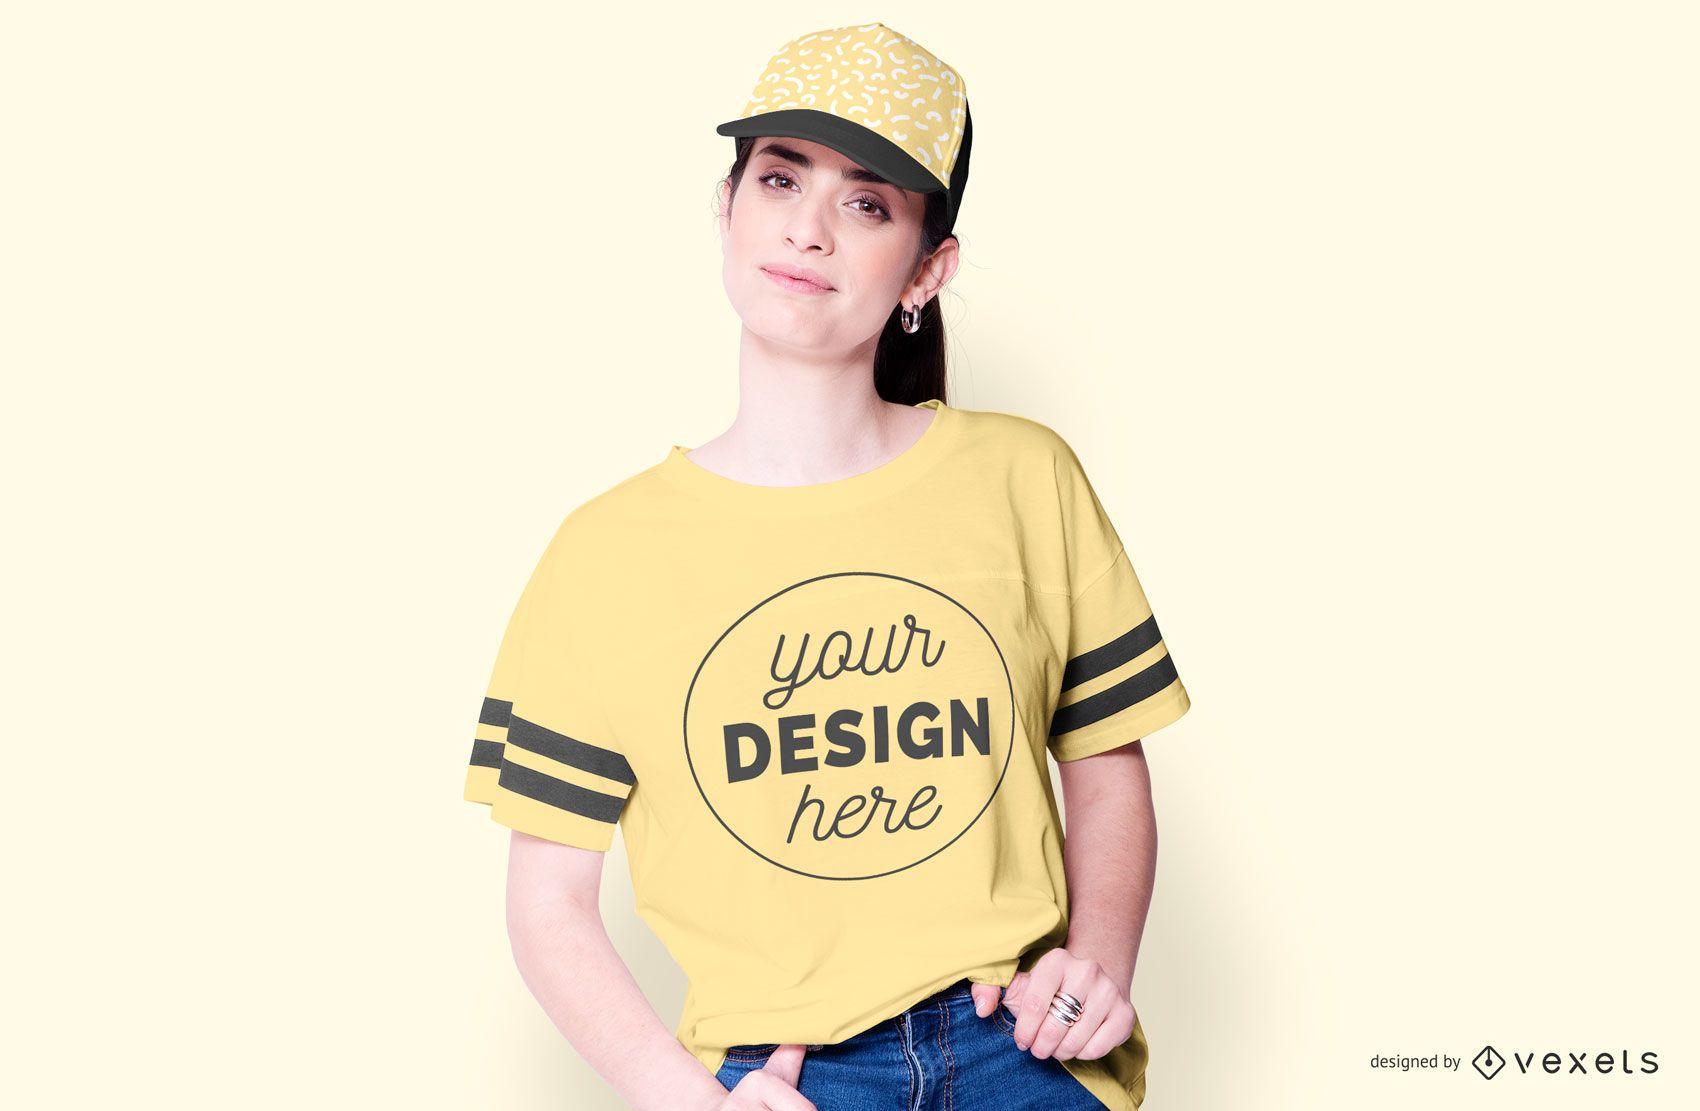 Maqueta de Camiseta de Chica con Sombrero